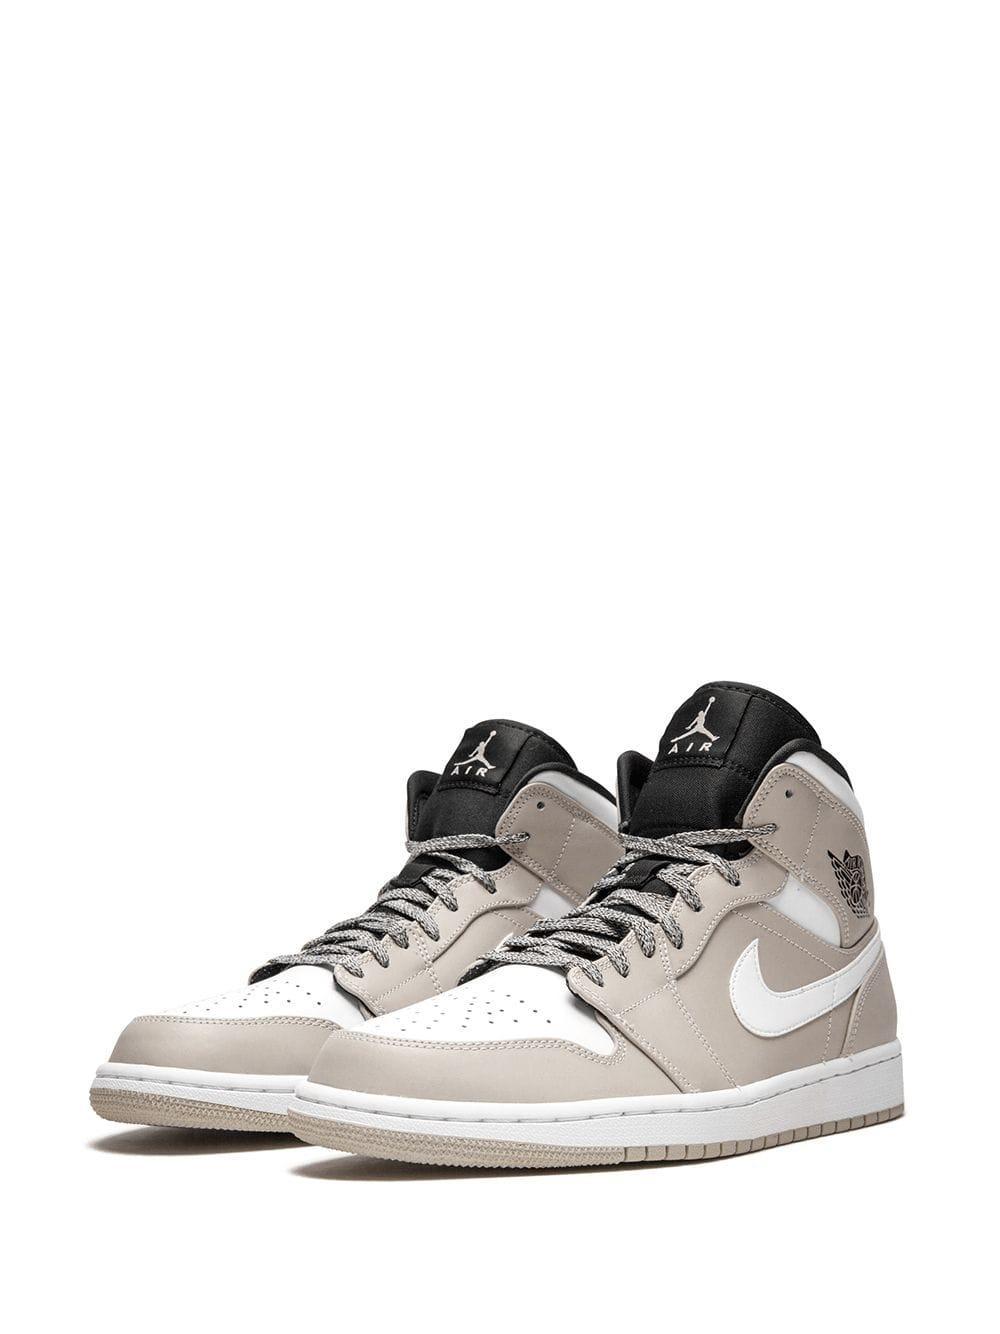 new arrival 8804c add42 Nike - Gray Air 1 Sneakers for Men - Lyst. View fullscreen